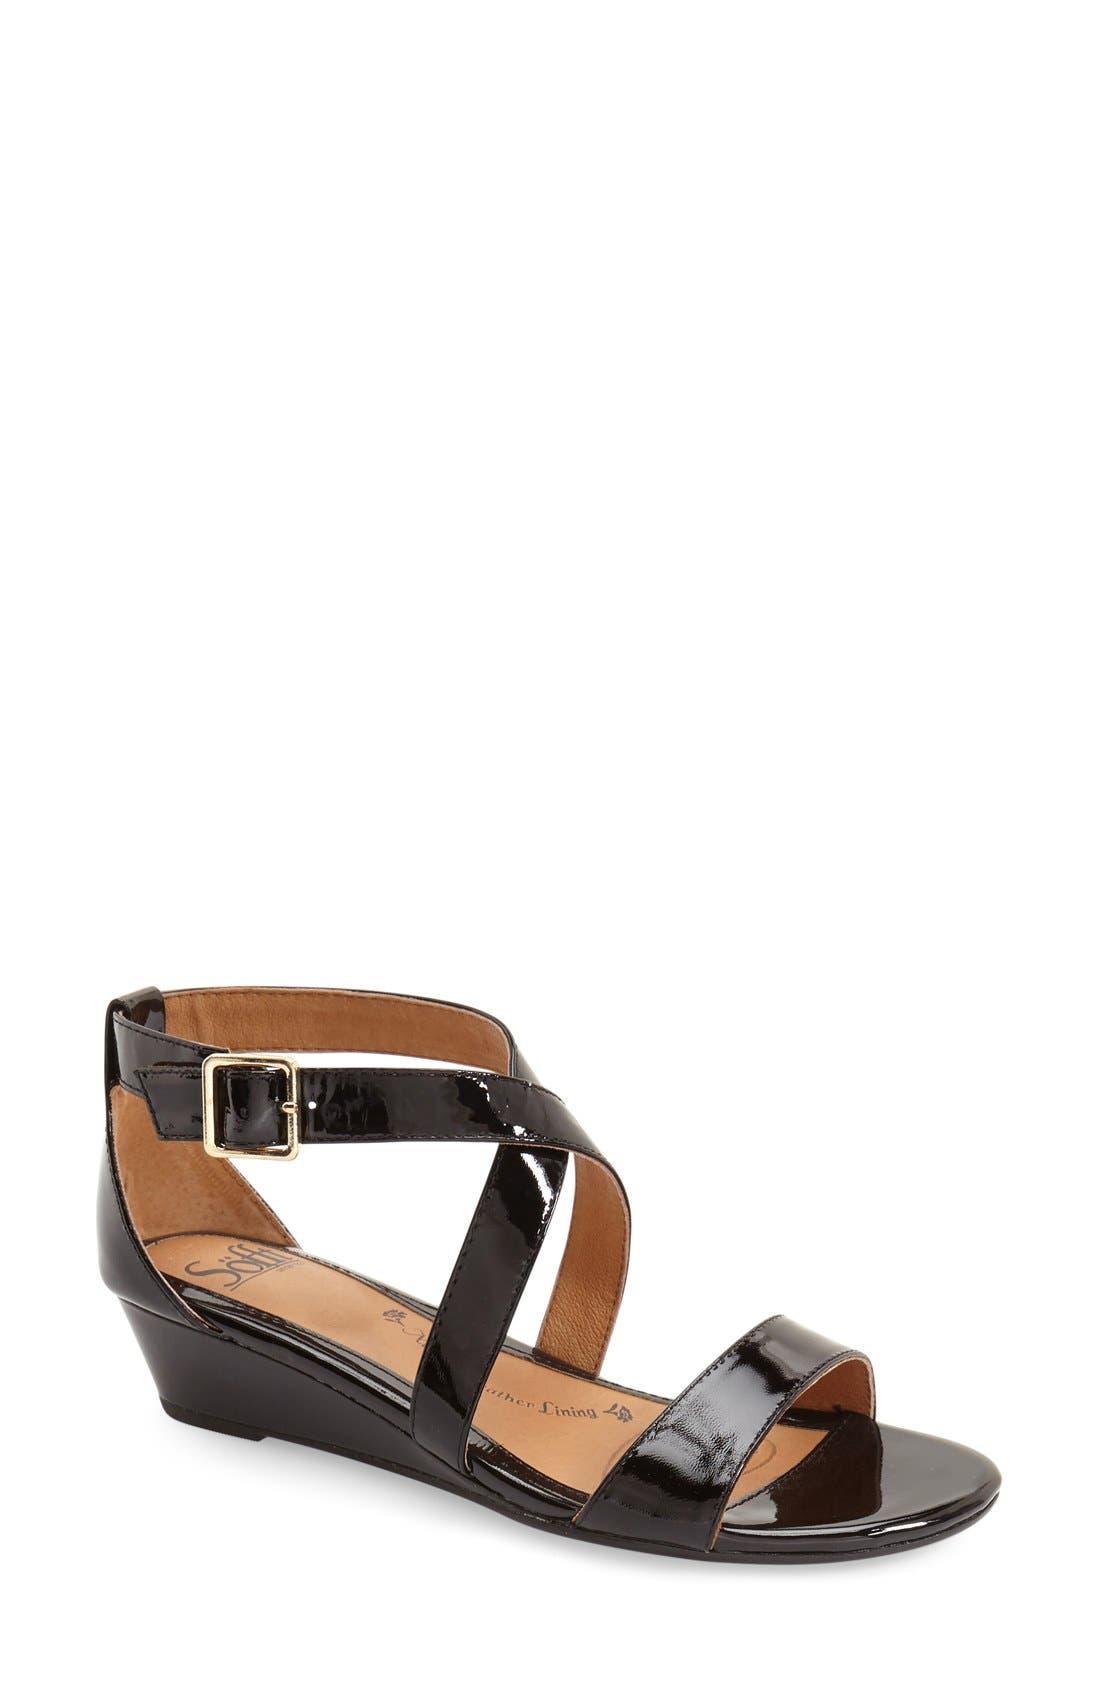 'Innis' Low Wedge Sandal,                             Main thumbnail 5, color,